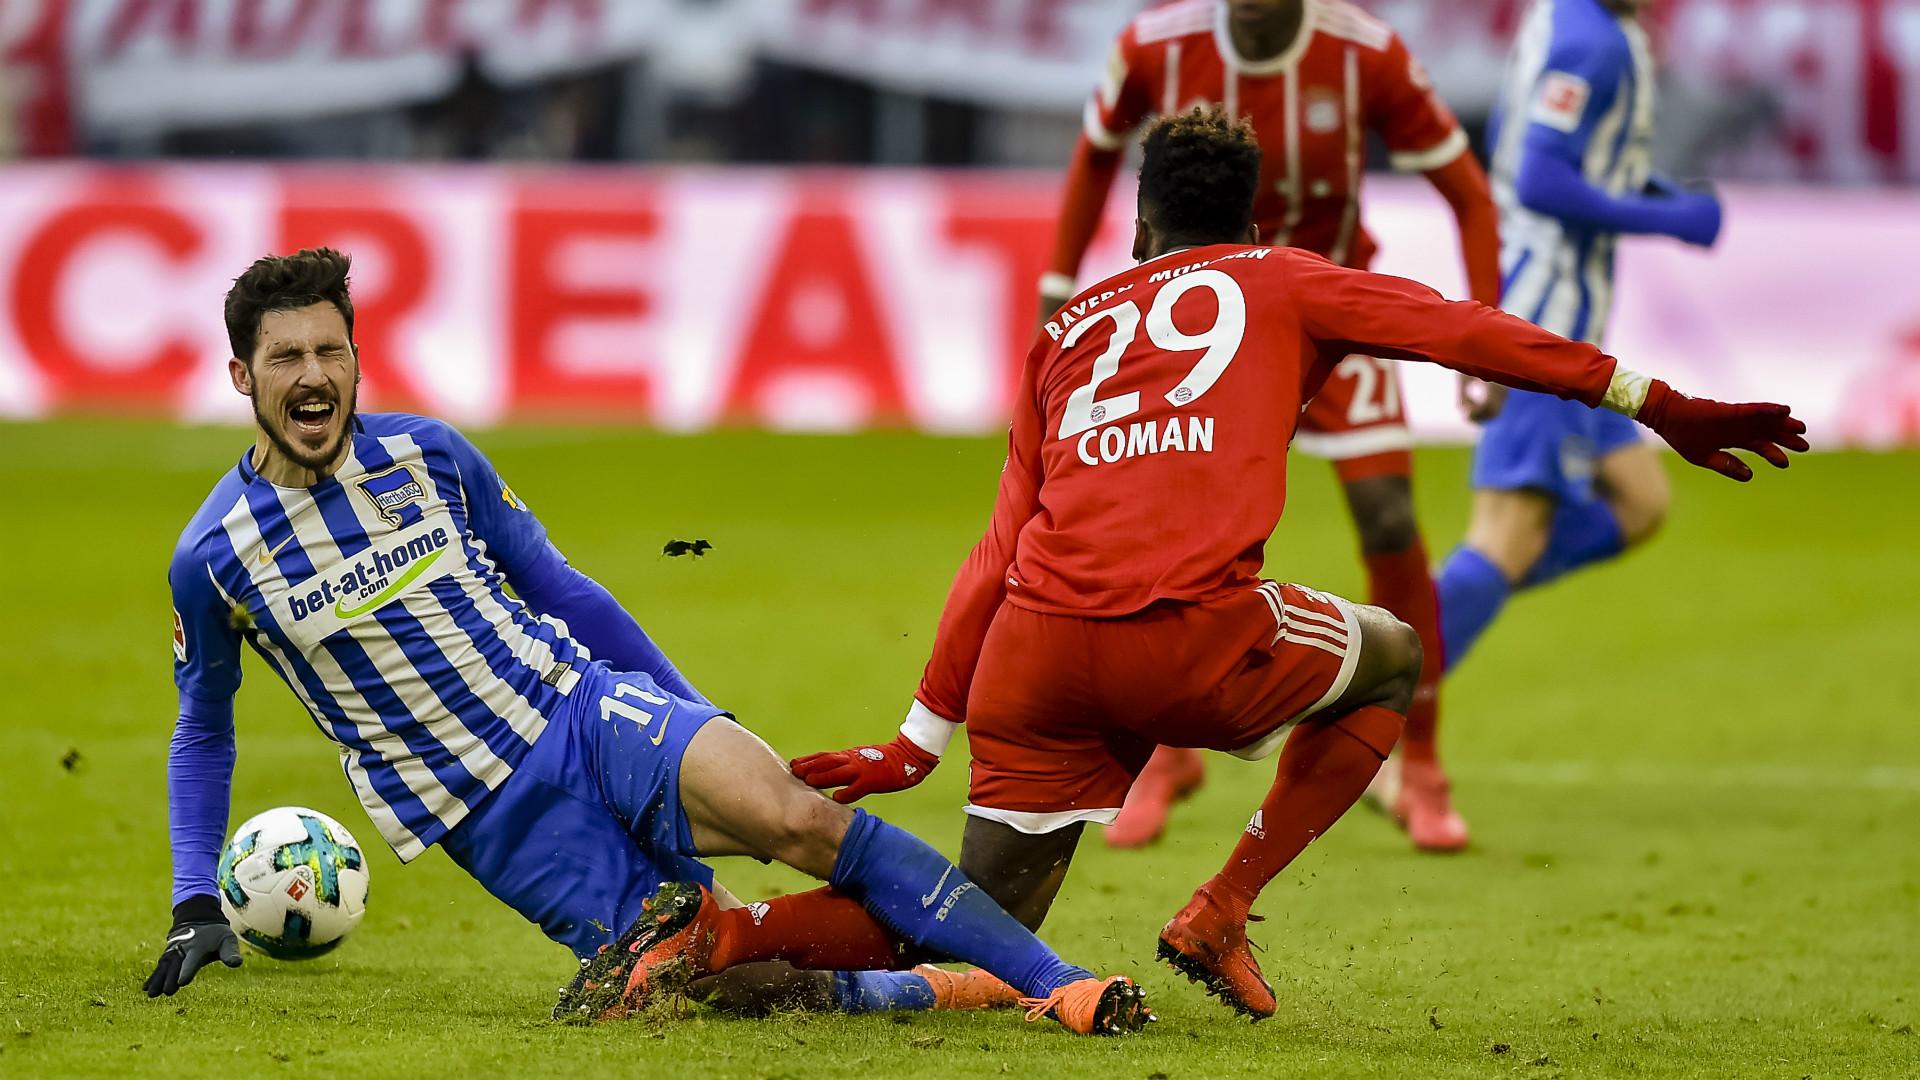 FC Bayern: Coman verletzt sich am Sprunggelenk